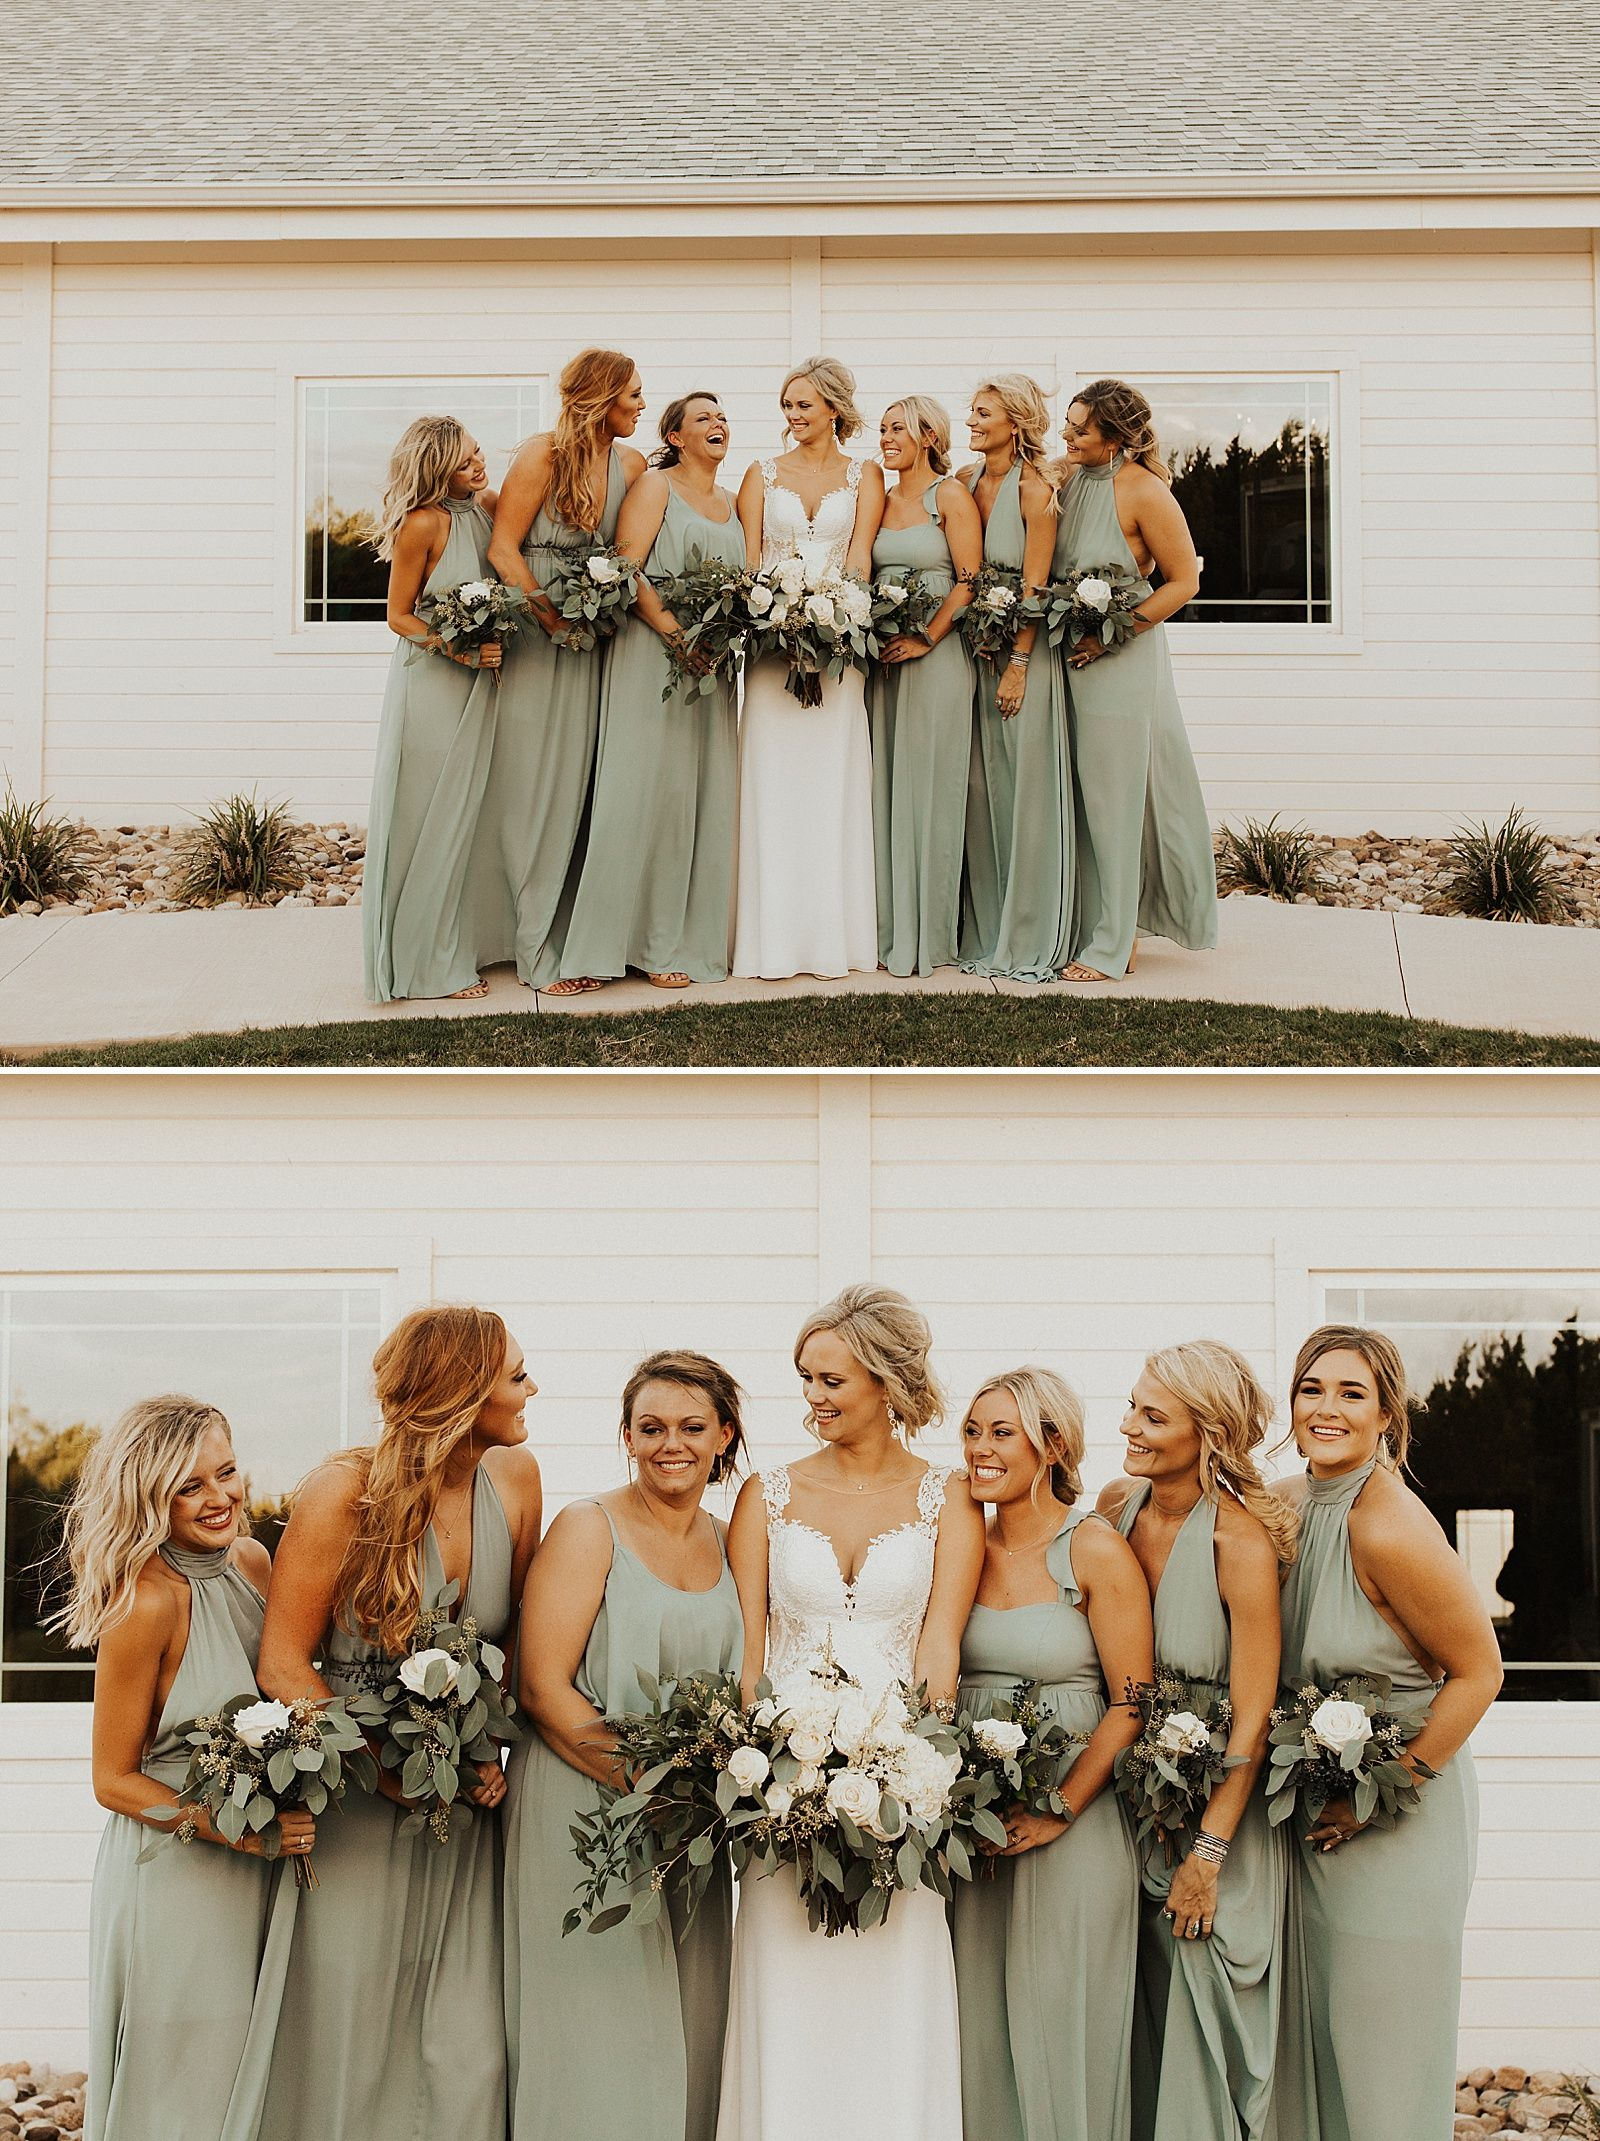 Sabrina Cedars White Barn Wedding in Austin, TX